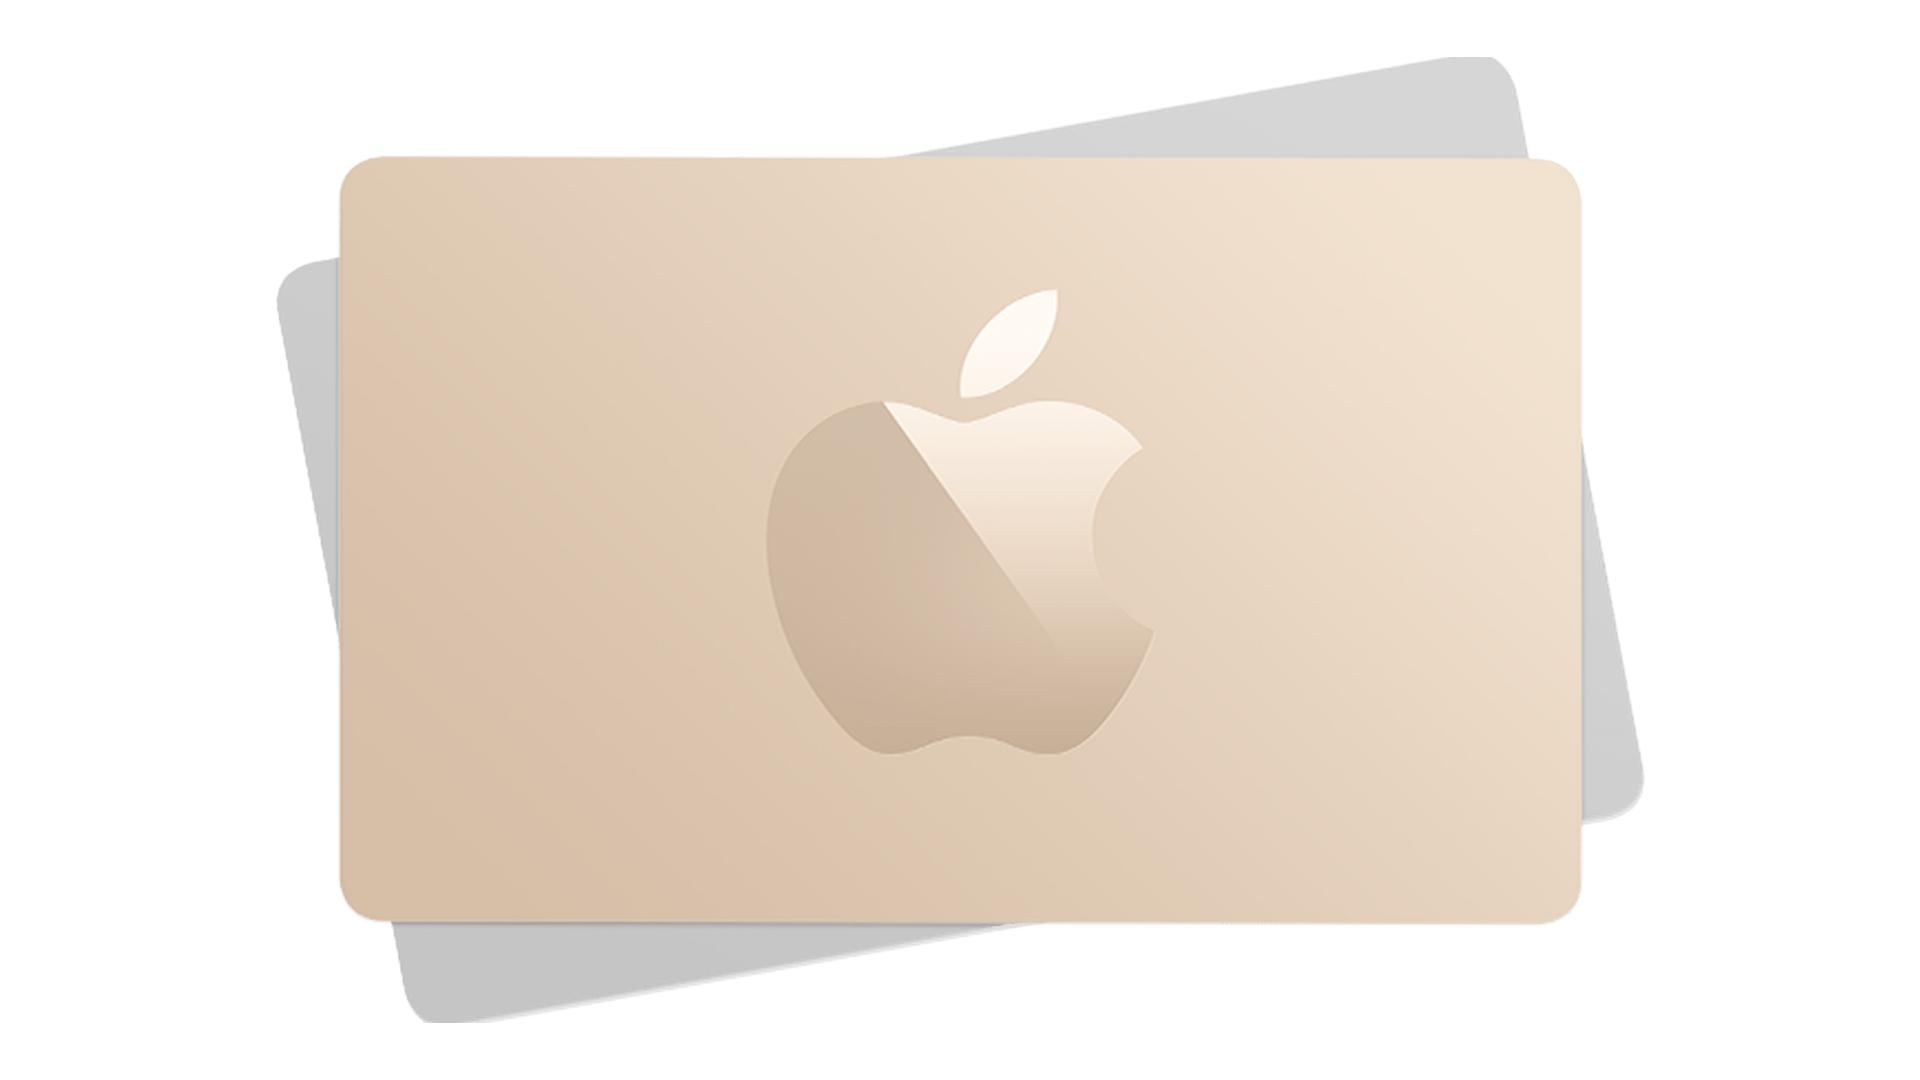 thumb-apple.png